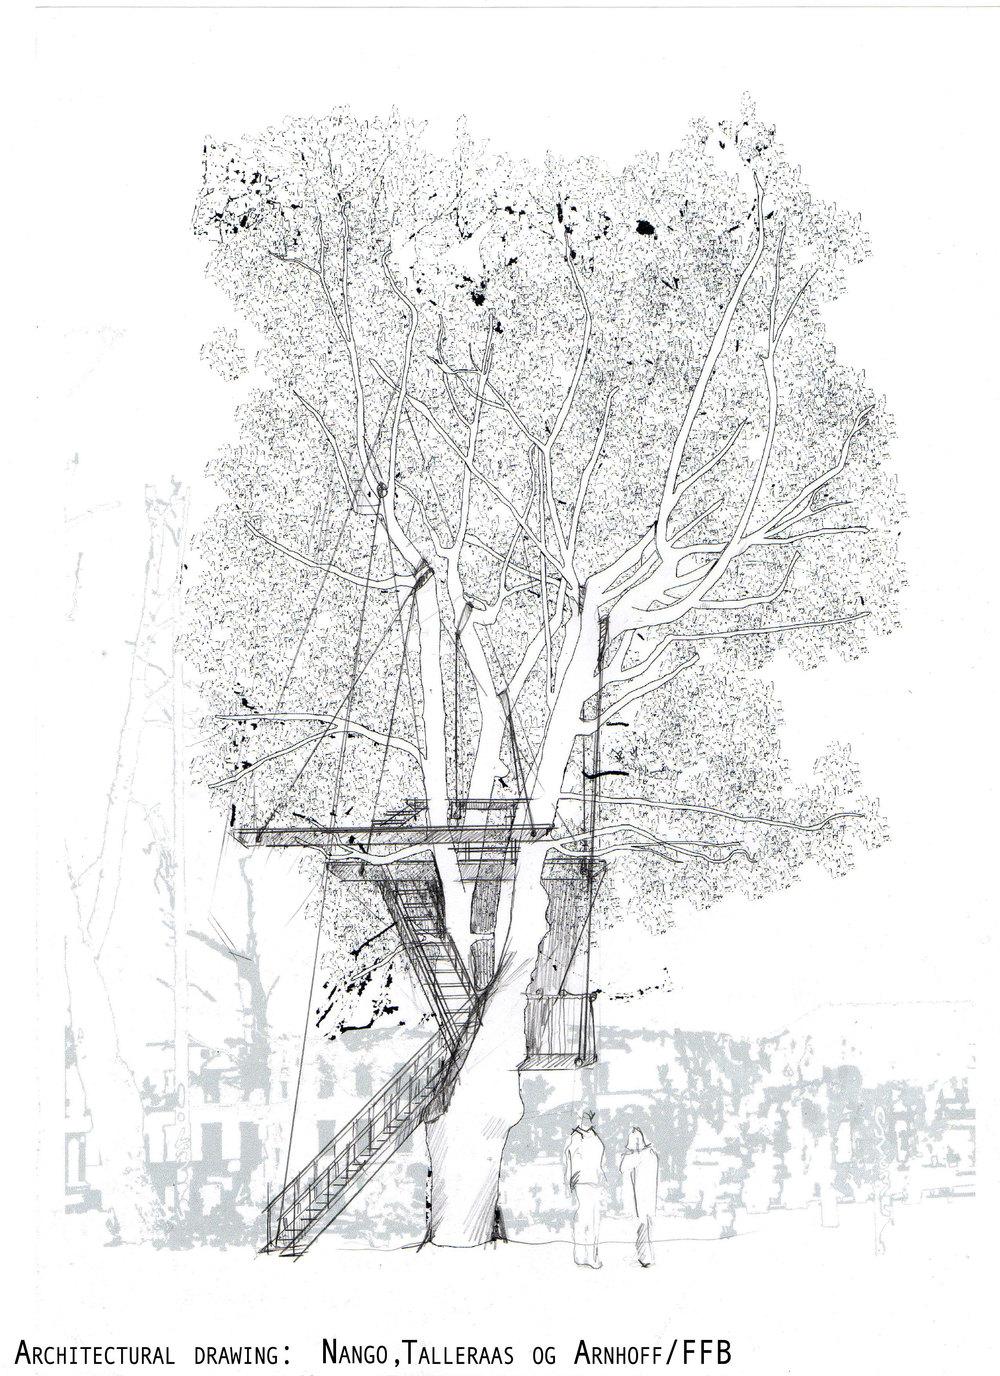 Architectural drawing: Nago, Talleraas og Arnhoff/ FFB